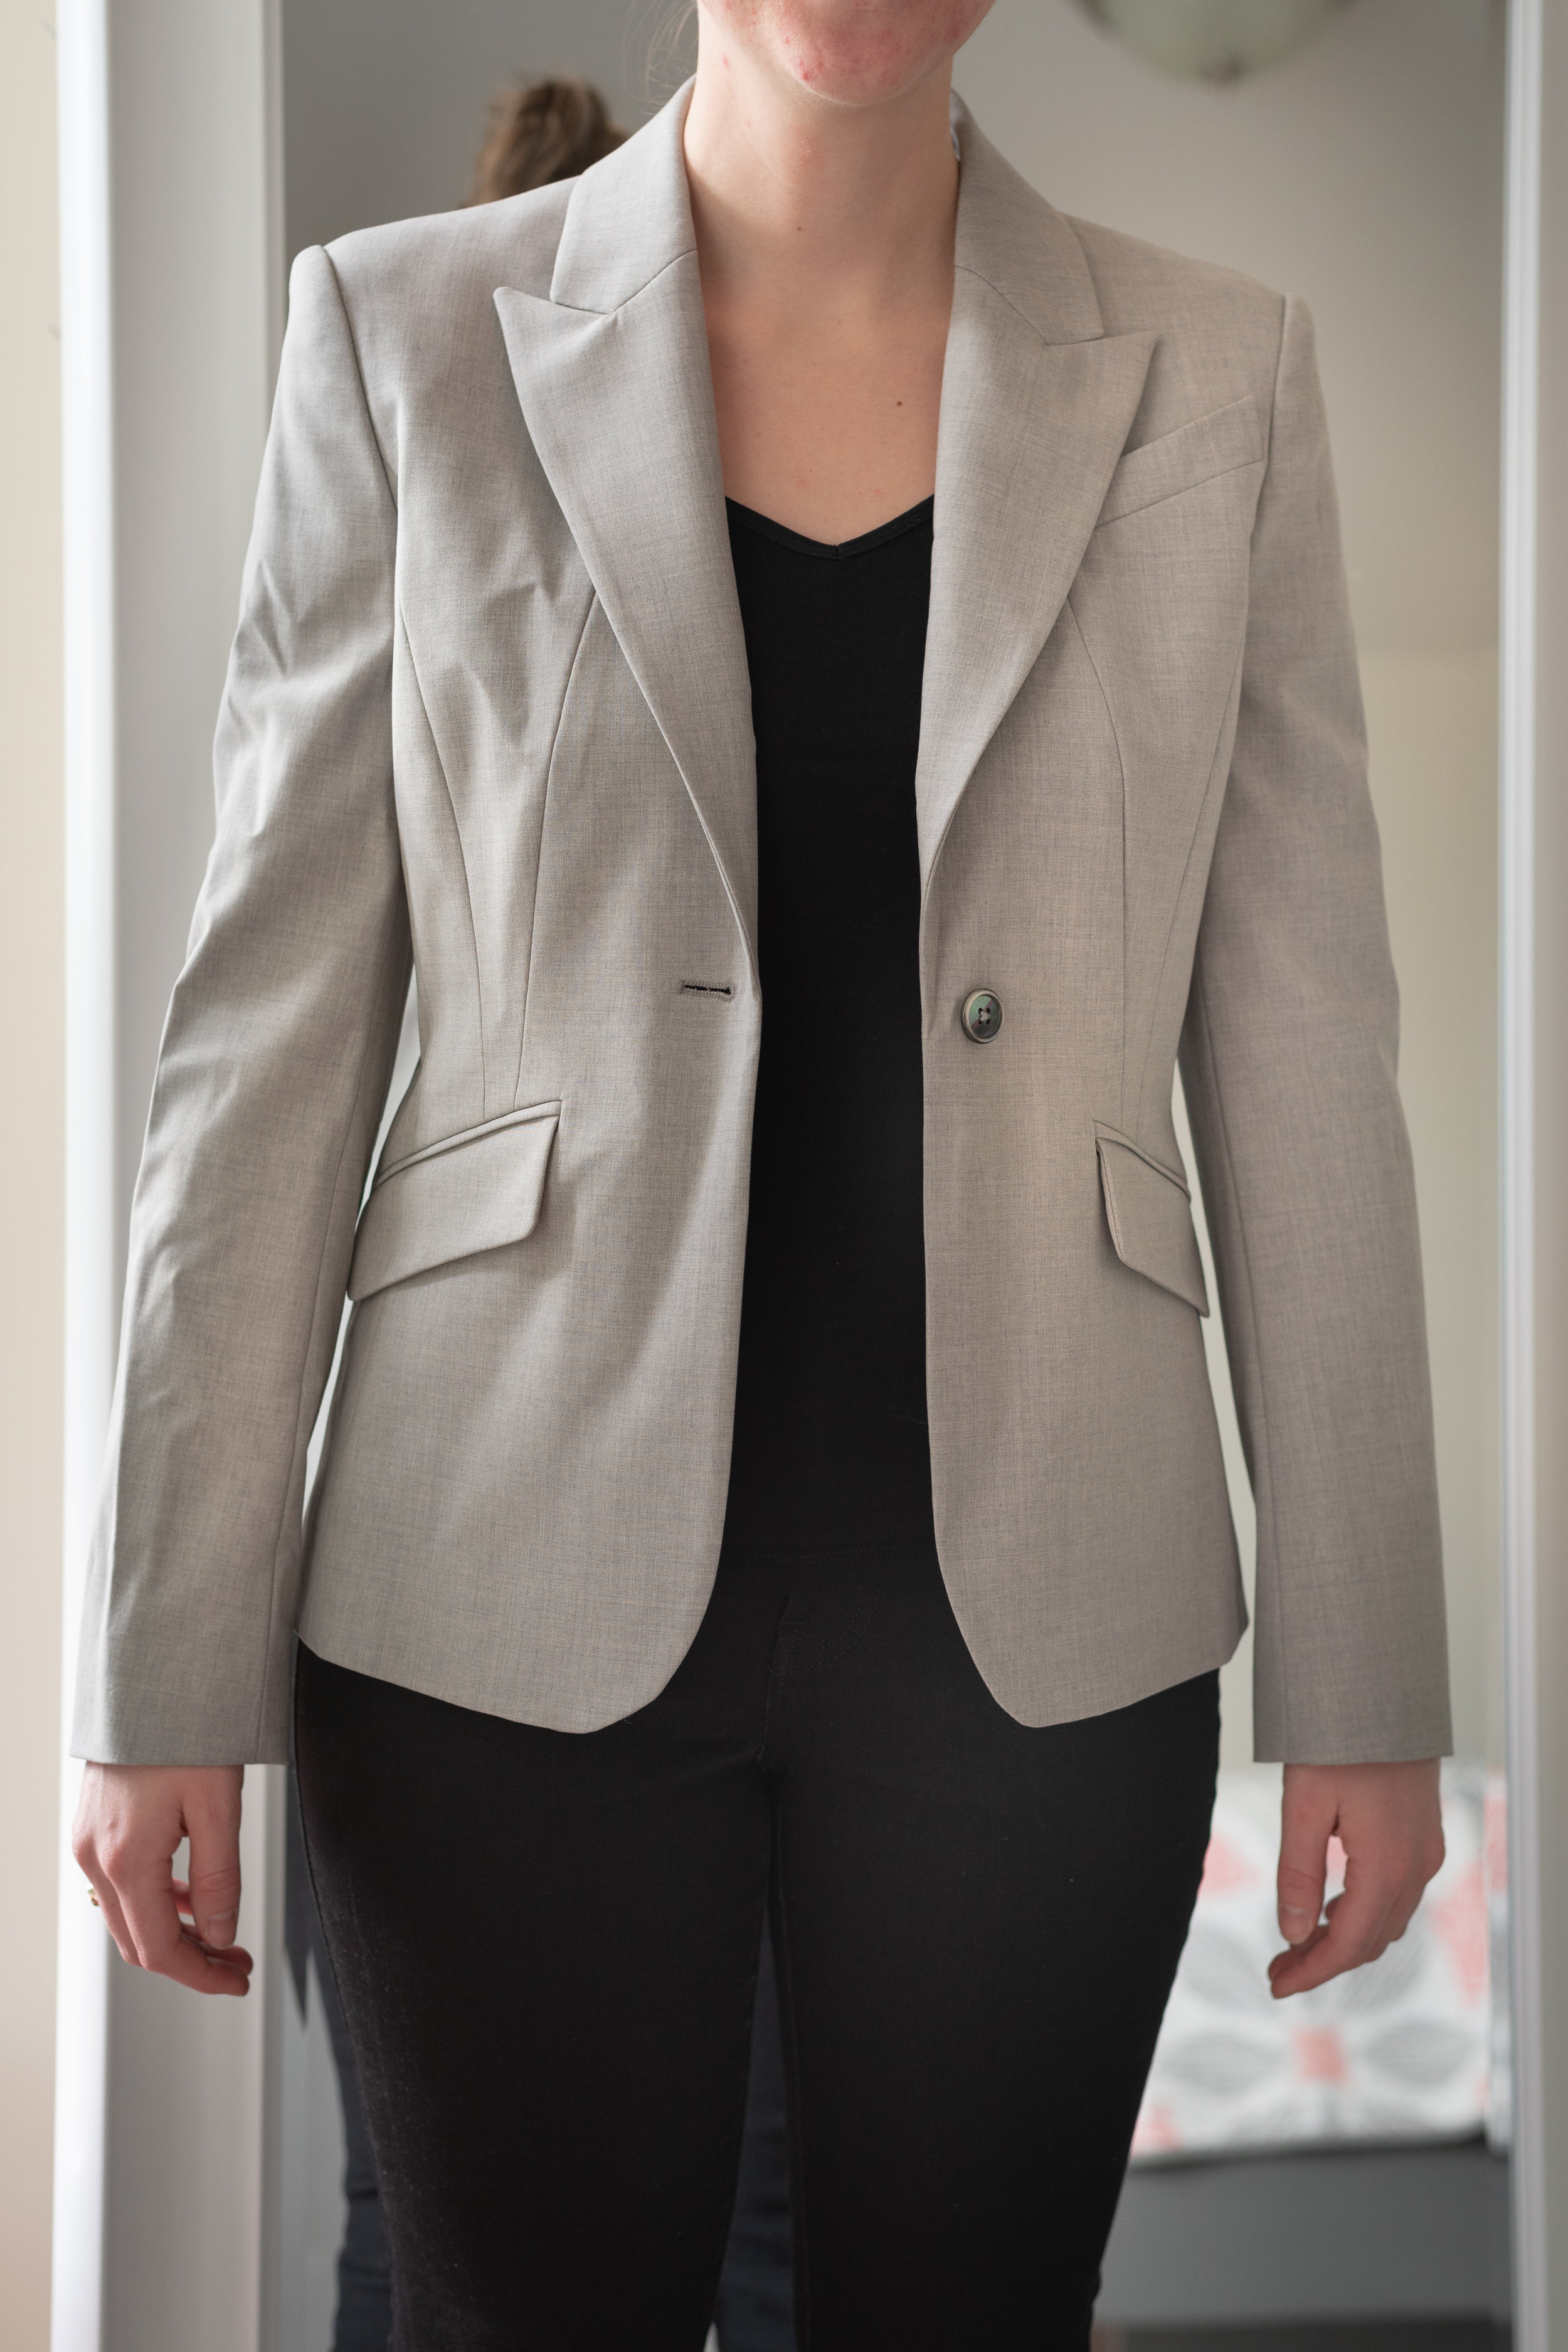 Brooks Brothers Petite Stretch-Wool Peak Lapel Jacket - Size 6 Petite